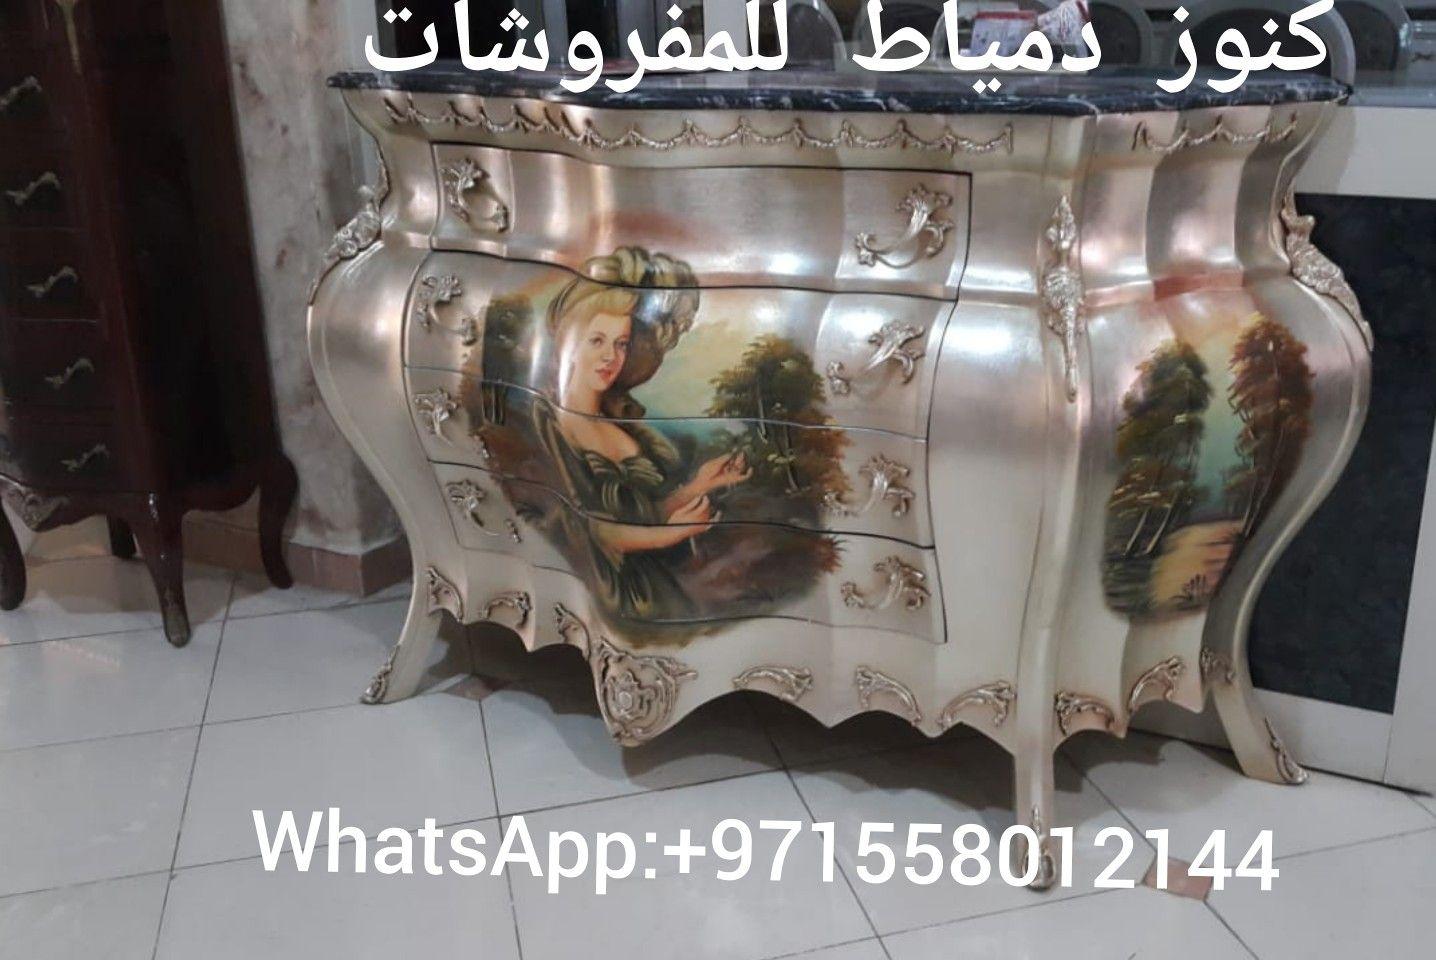 Pin By Knooz Dumyat Furniture On انتيكات كنسول طاولة مدخل فاترينه Decorative Jars Decor Home Decor